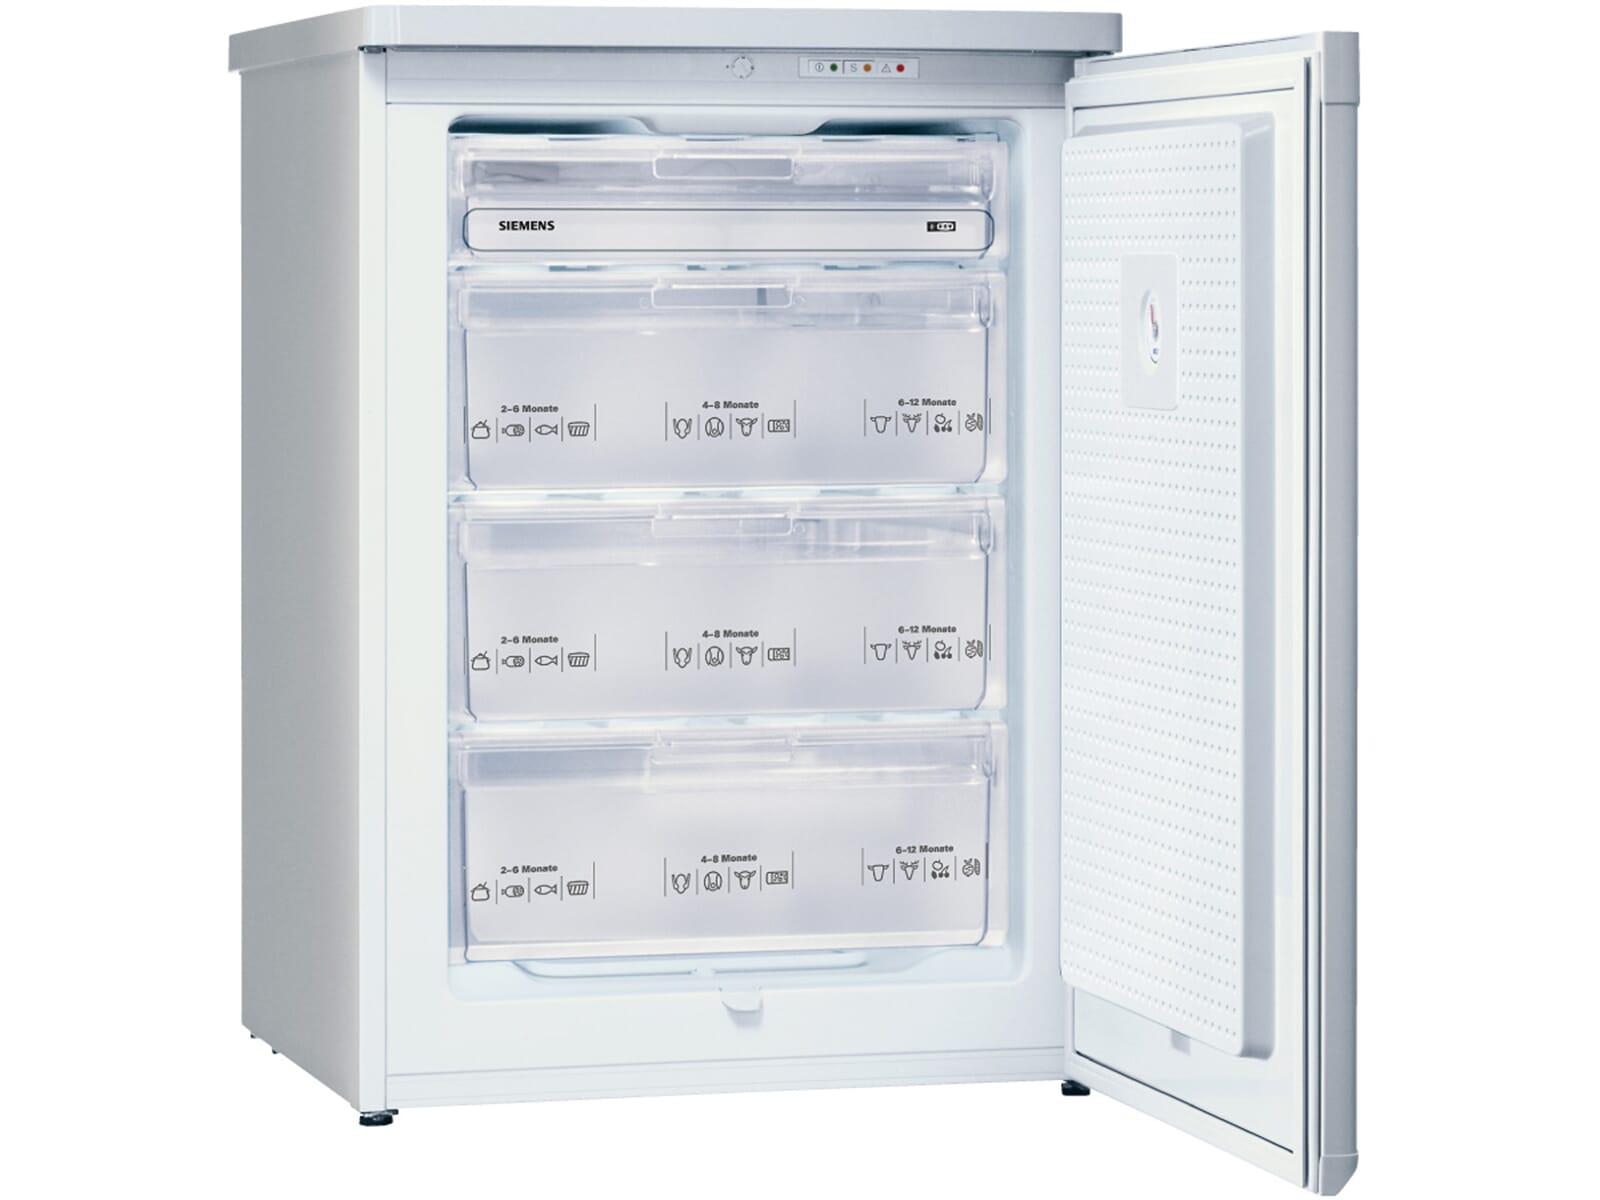 Amica Uks16158 Kühlschrank : Gefrierschrank unterbaufähig amica kühlschrank l uks